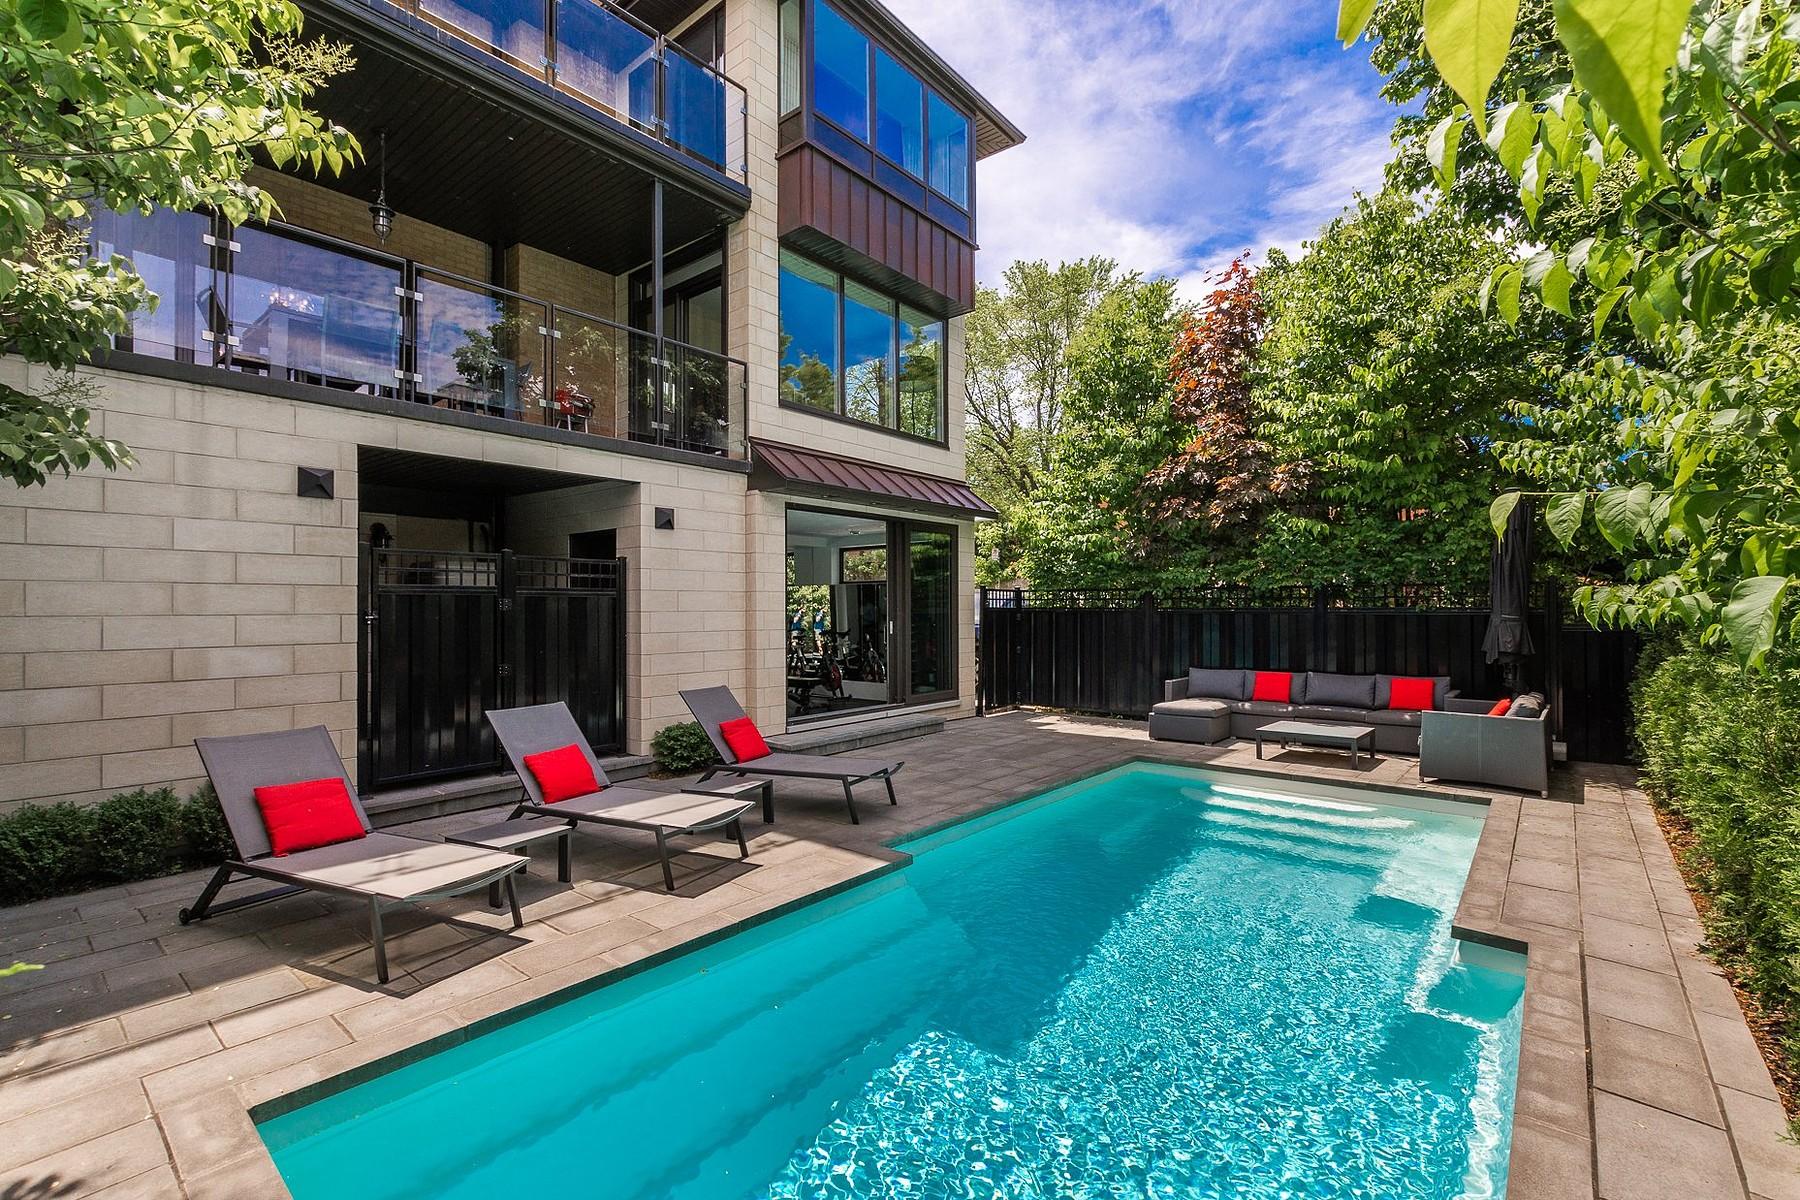 Single Family Homes for Sale at Outremont, Montréal 40 Av. Prince-Philip Outremont, Quebec H2V2E8 Canada